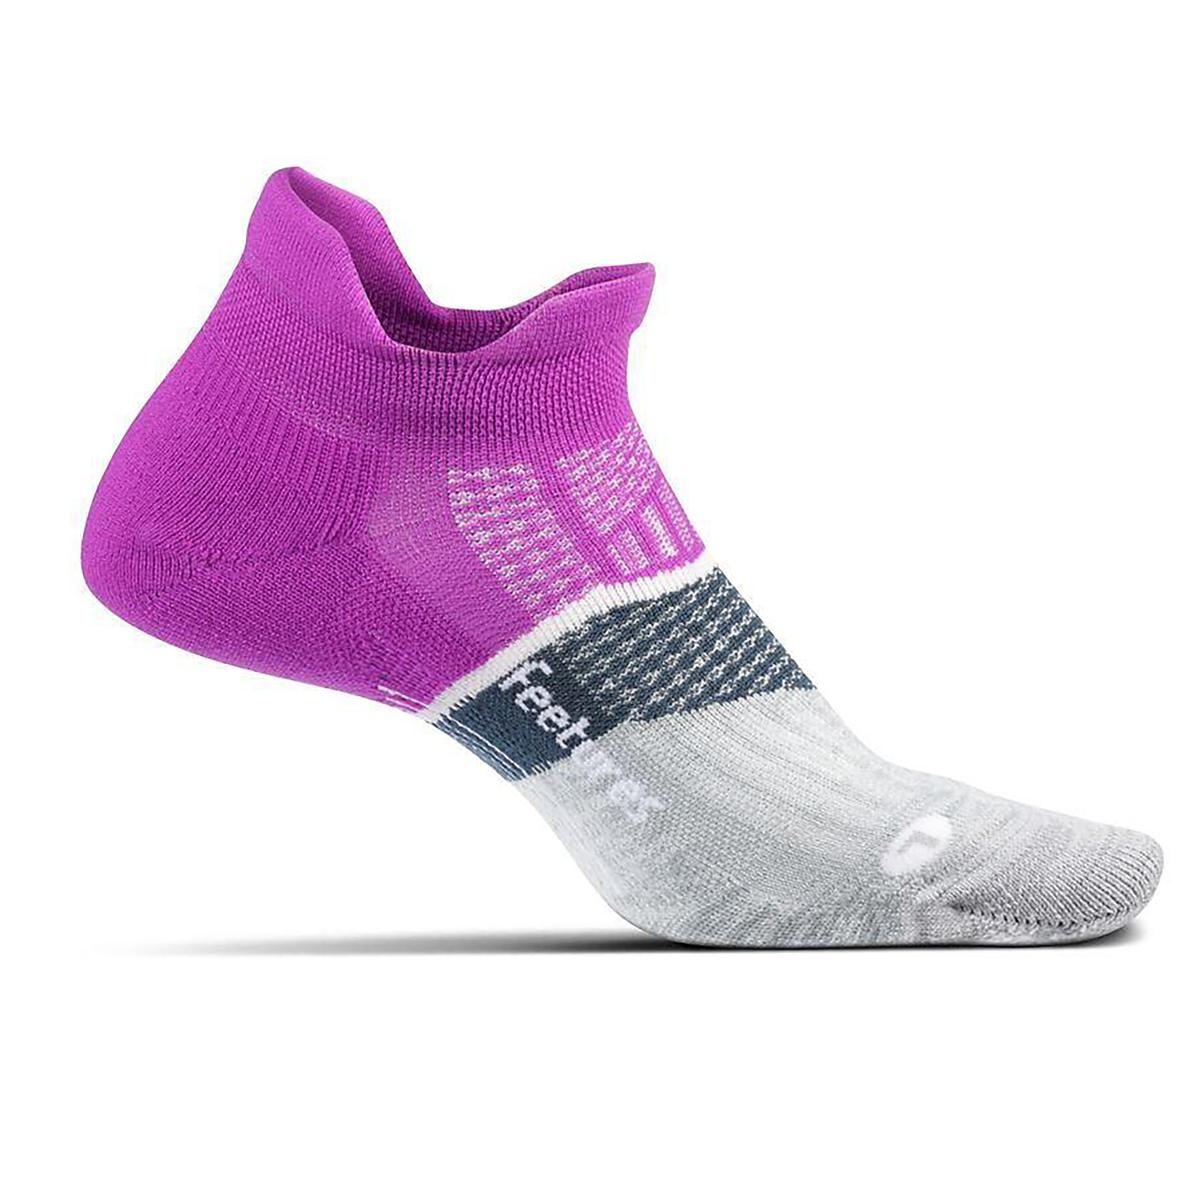 Feetures Elite Light Cushion No Show Tab Socks - Color: Purple Addict - Size: S, Purple Addict, large, image 1